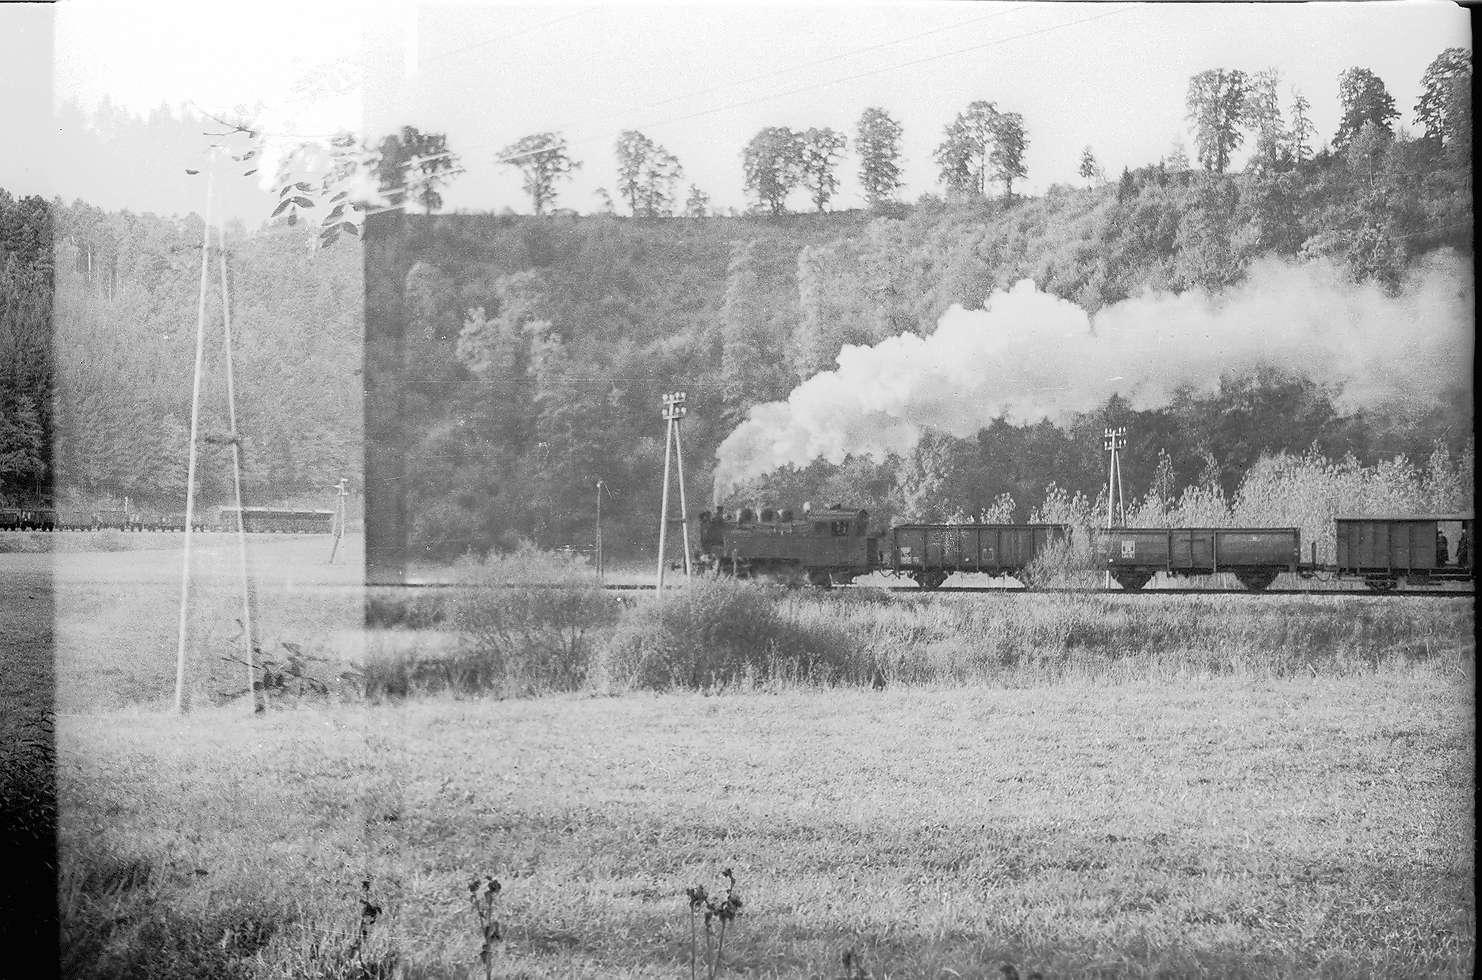 Dampflok 16, Güterzug mit Stückgutbeförderung G(ST)305 W im Eyachtal bei Bad Imnau, Bild 1